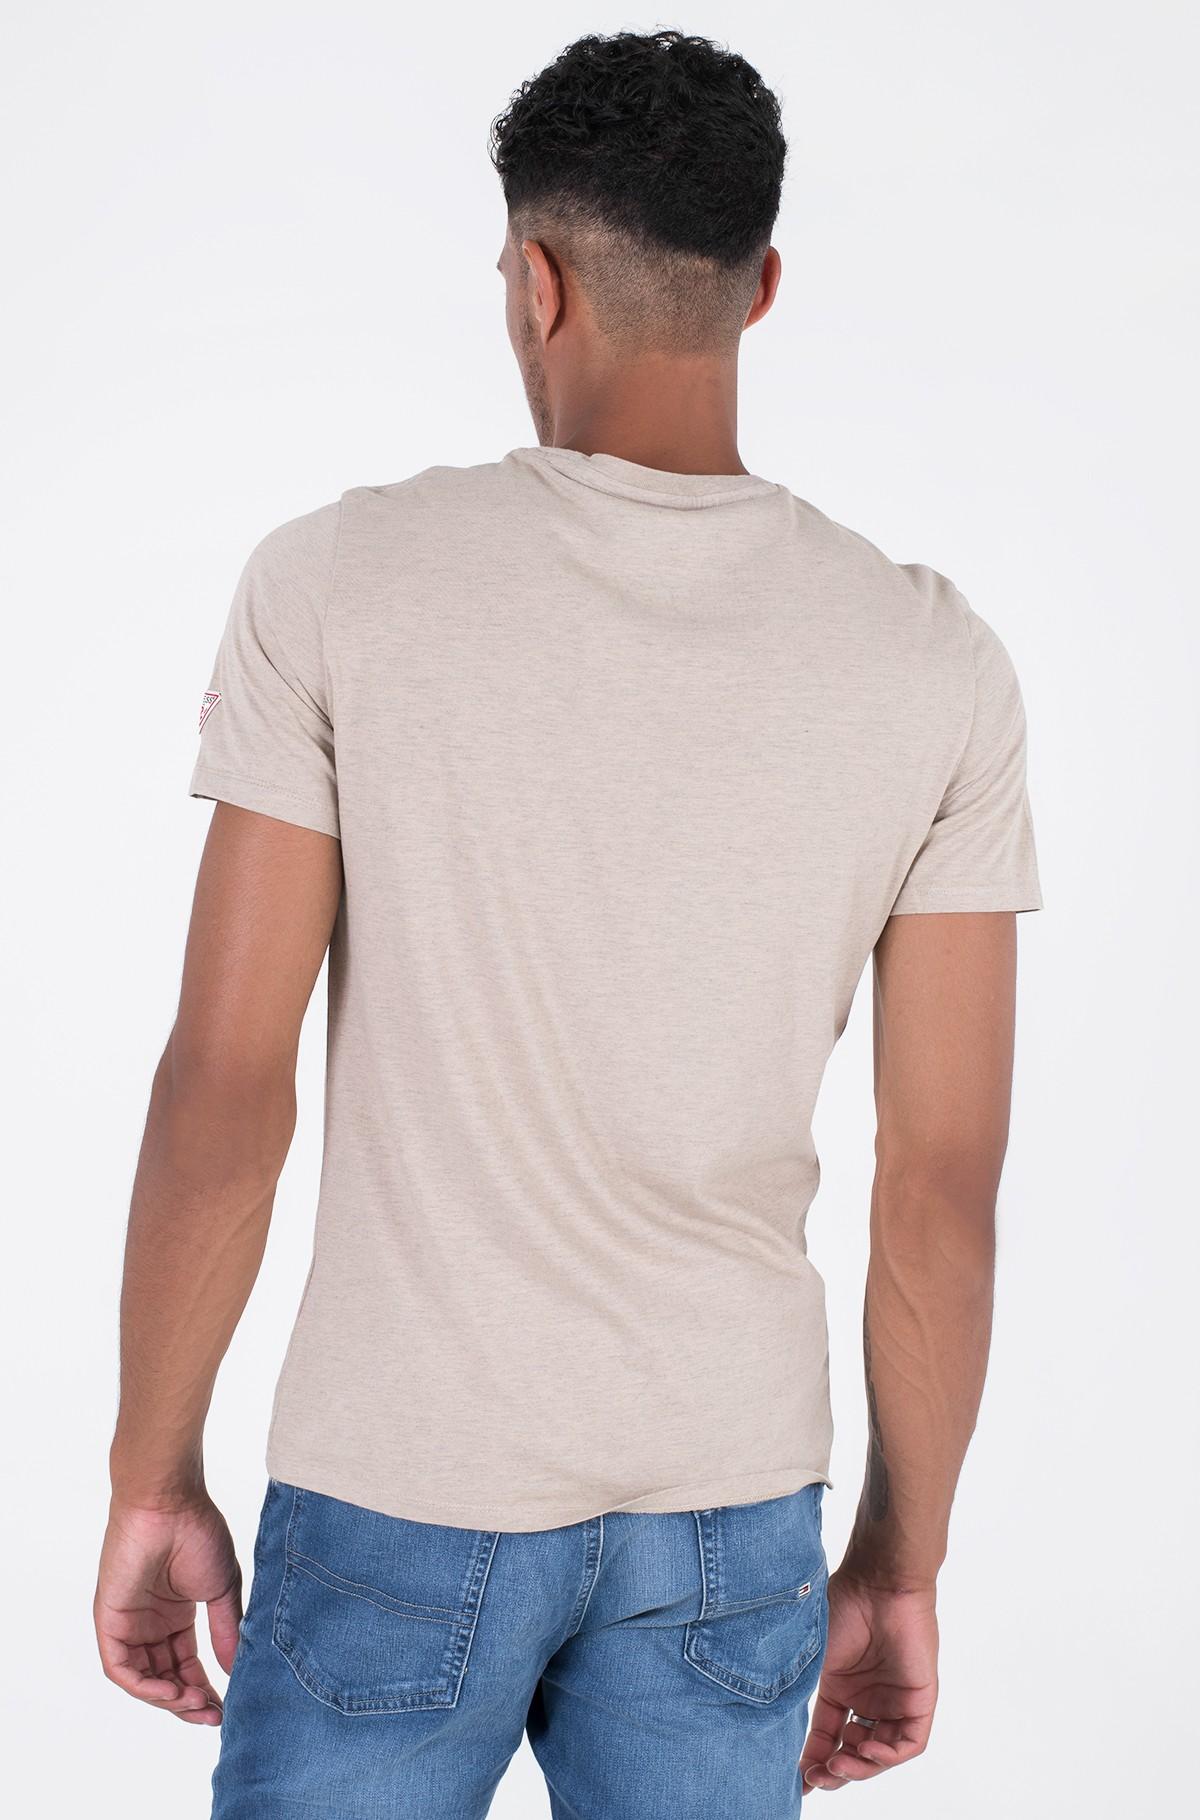 T-shirt M1YI84 I3Z11-full-2